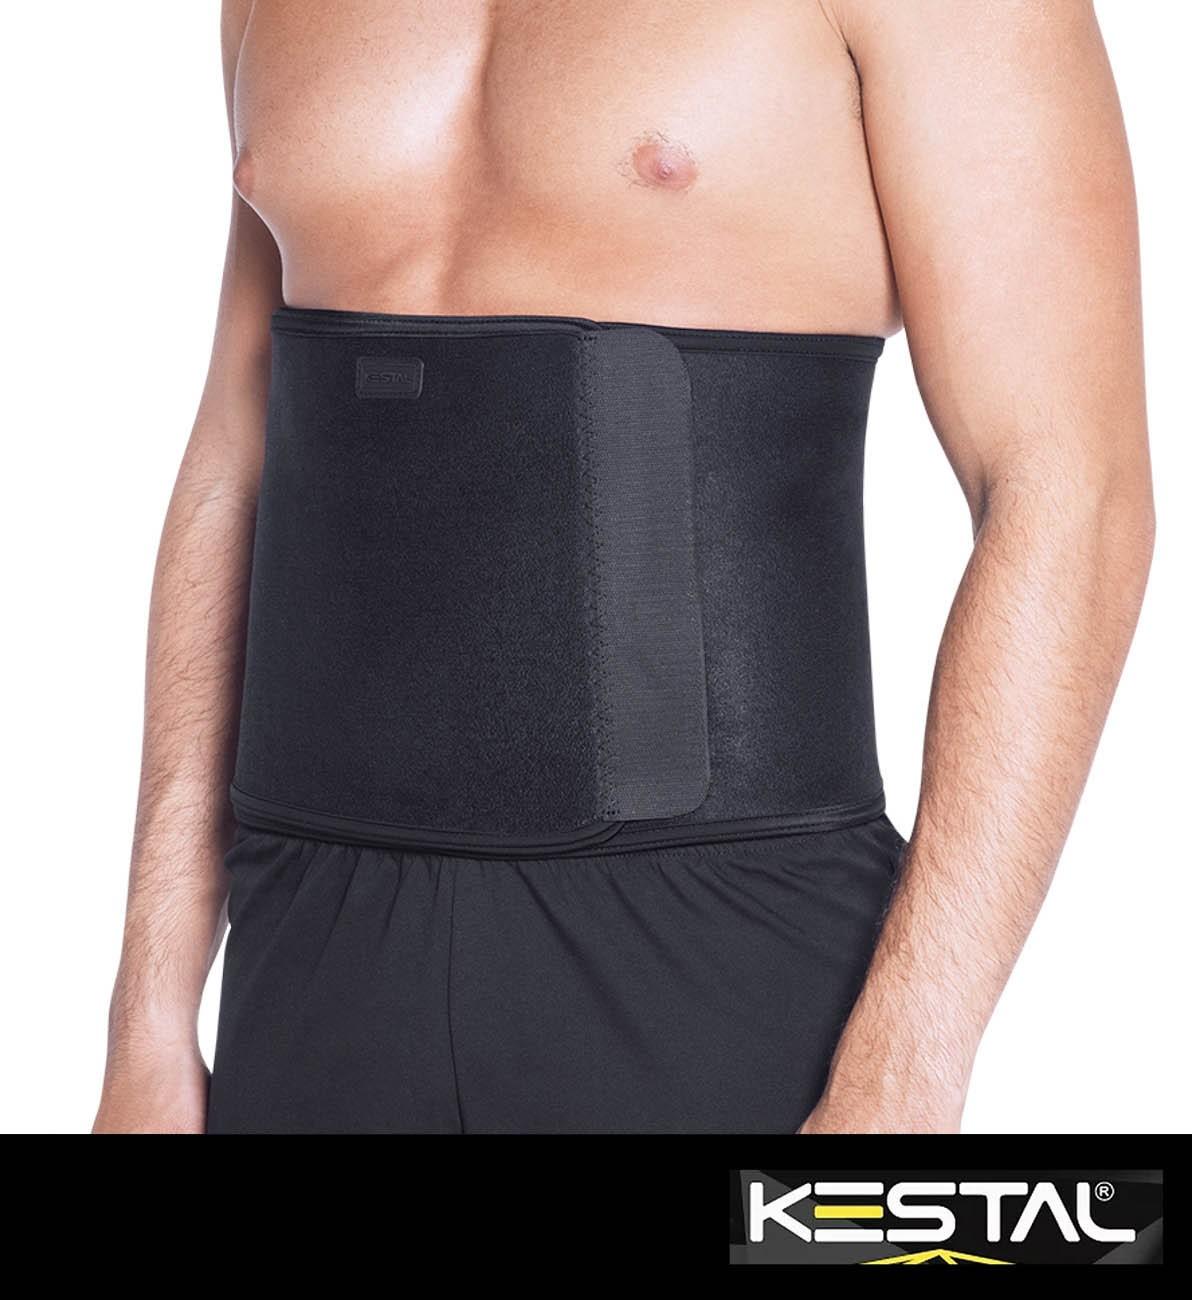 Faixa Abdominal Pós Cirúrgica (KSN014) - Kestal